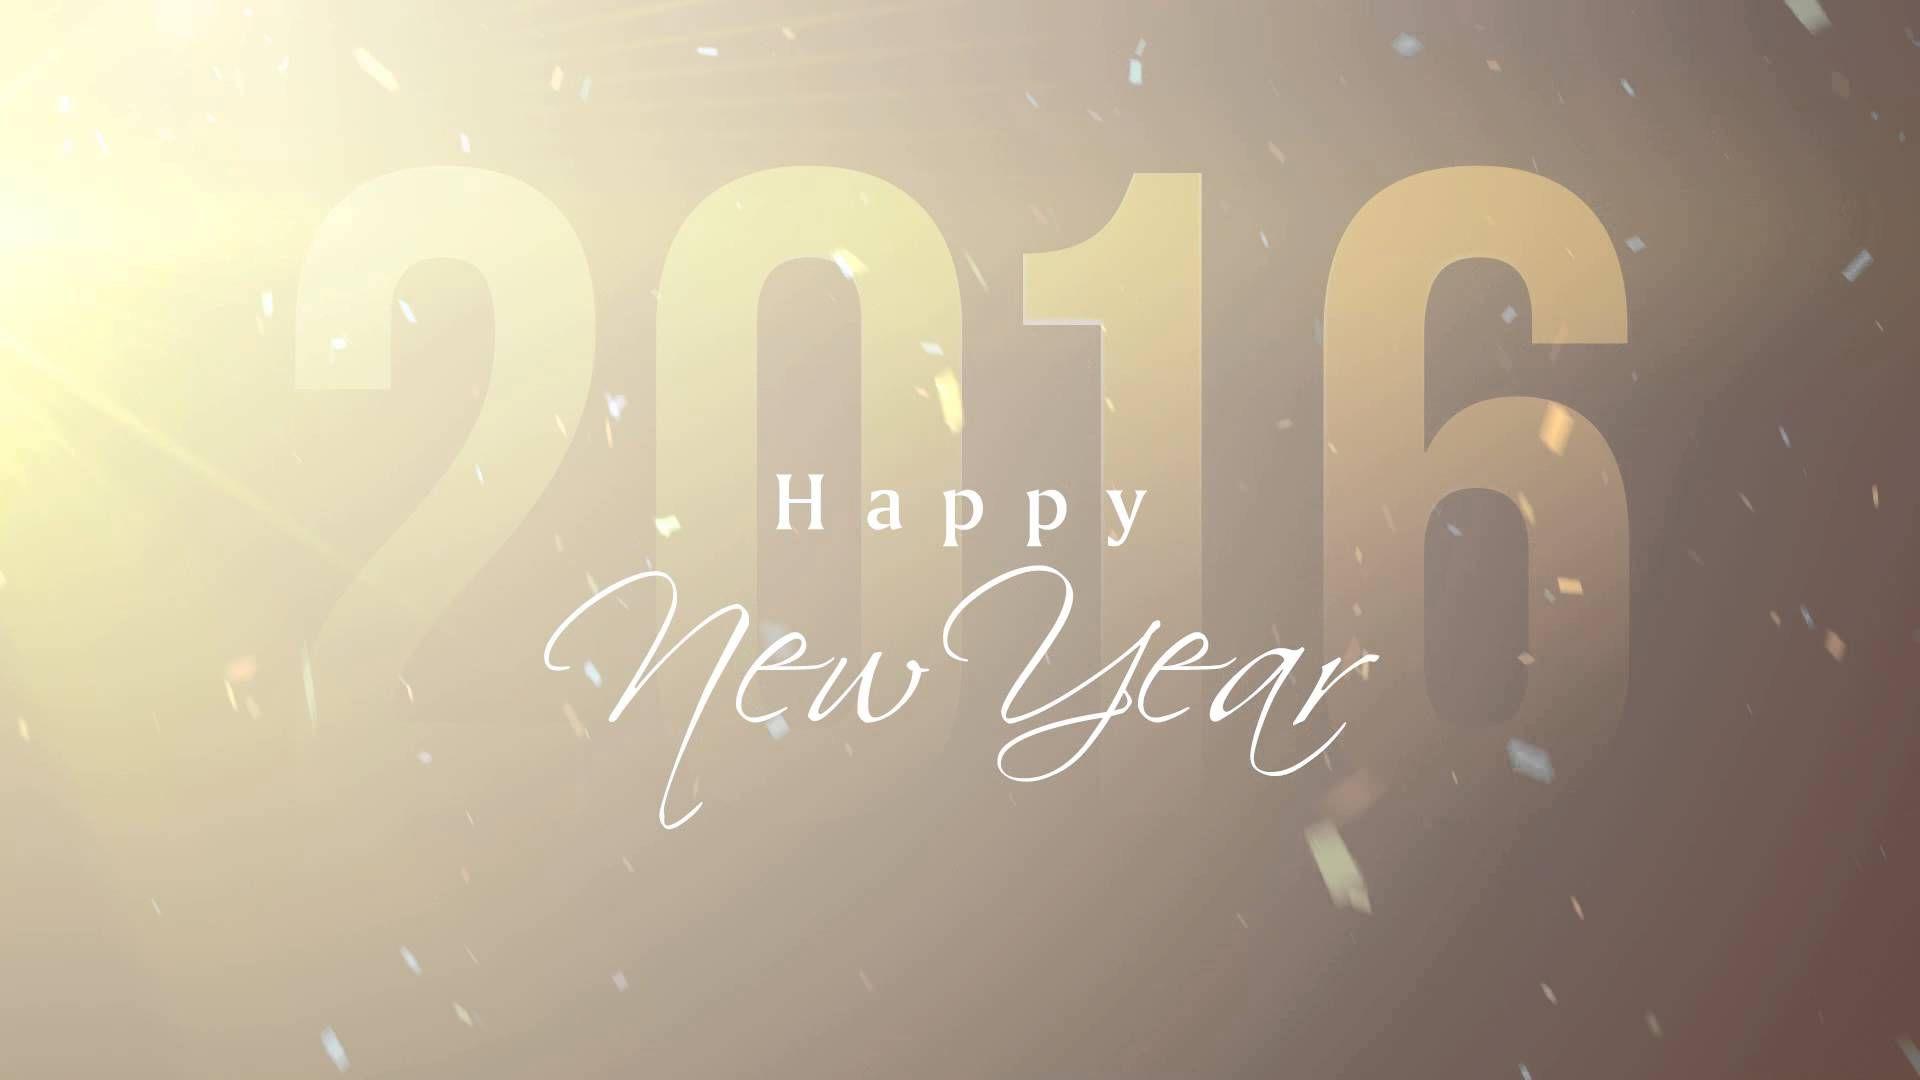 best 25 happy new year wallpaper ideas on pinterest happy new year happy new year background and happy new